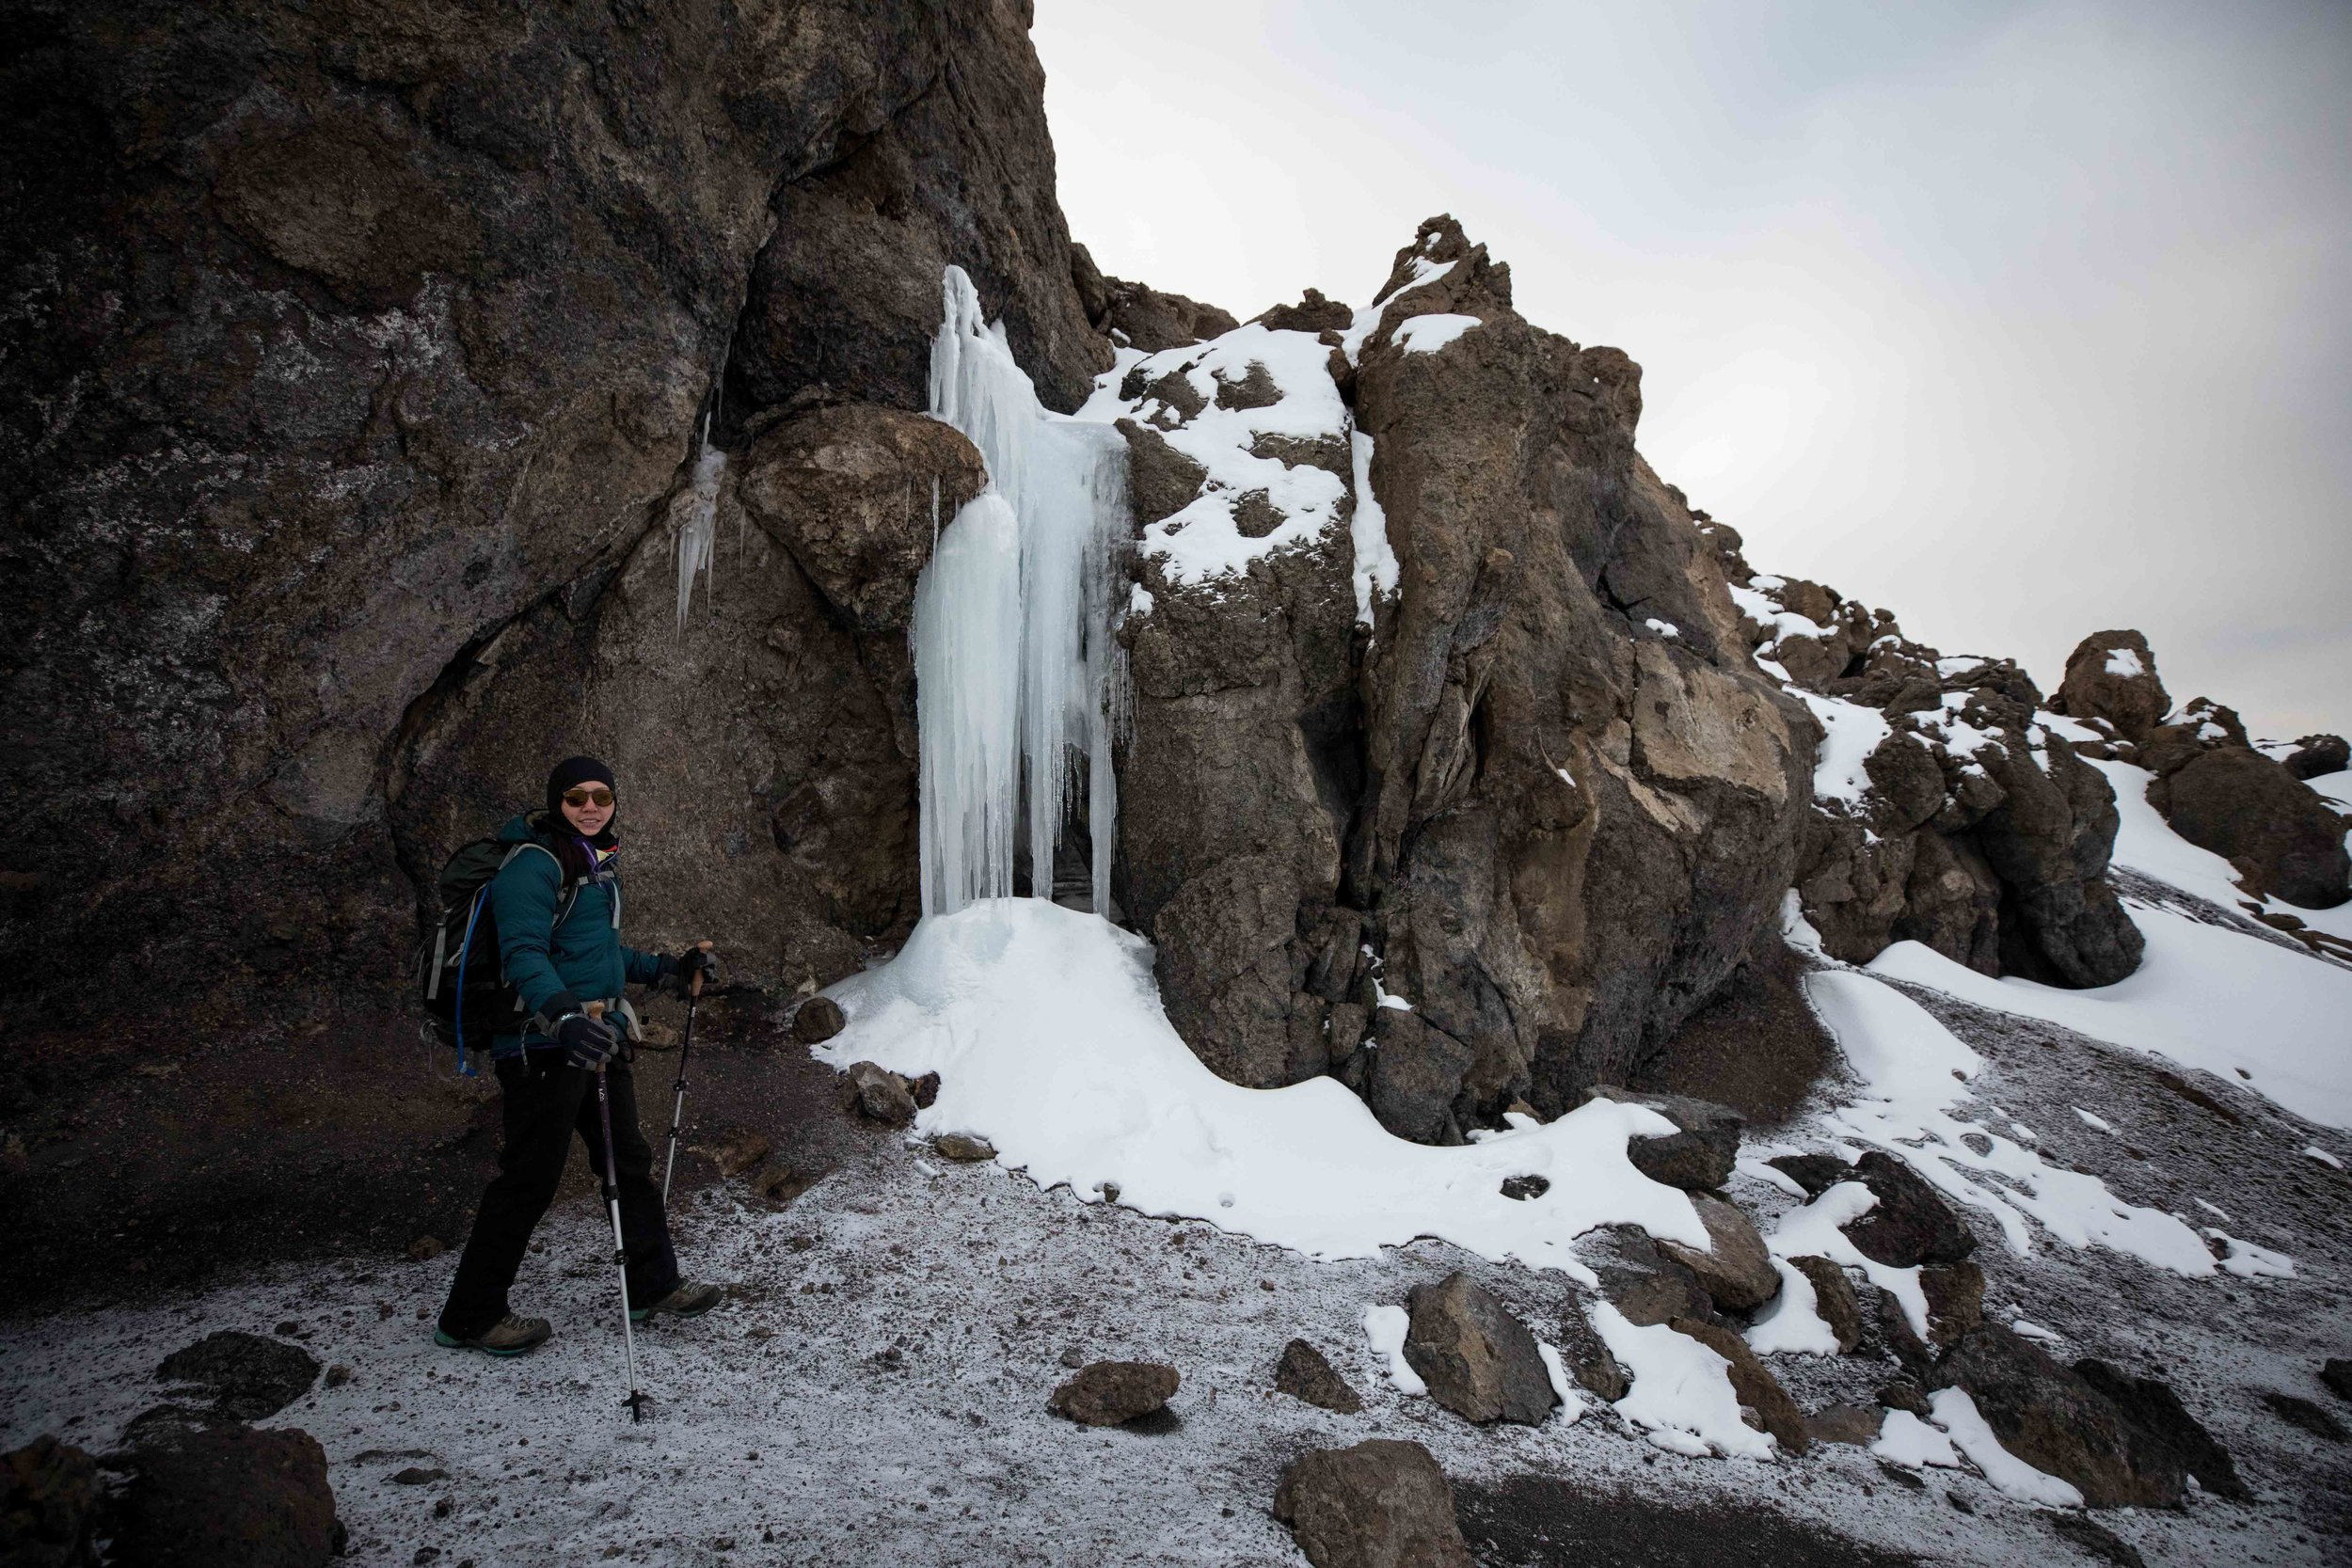 ajw_REI_Kilimanjaro-9.jpg